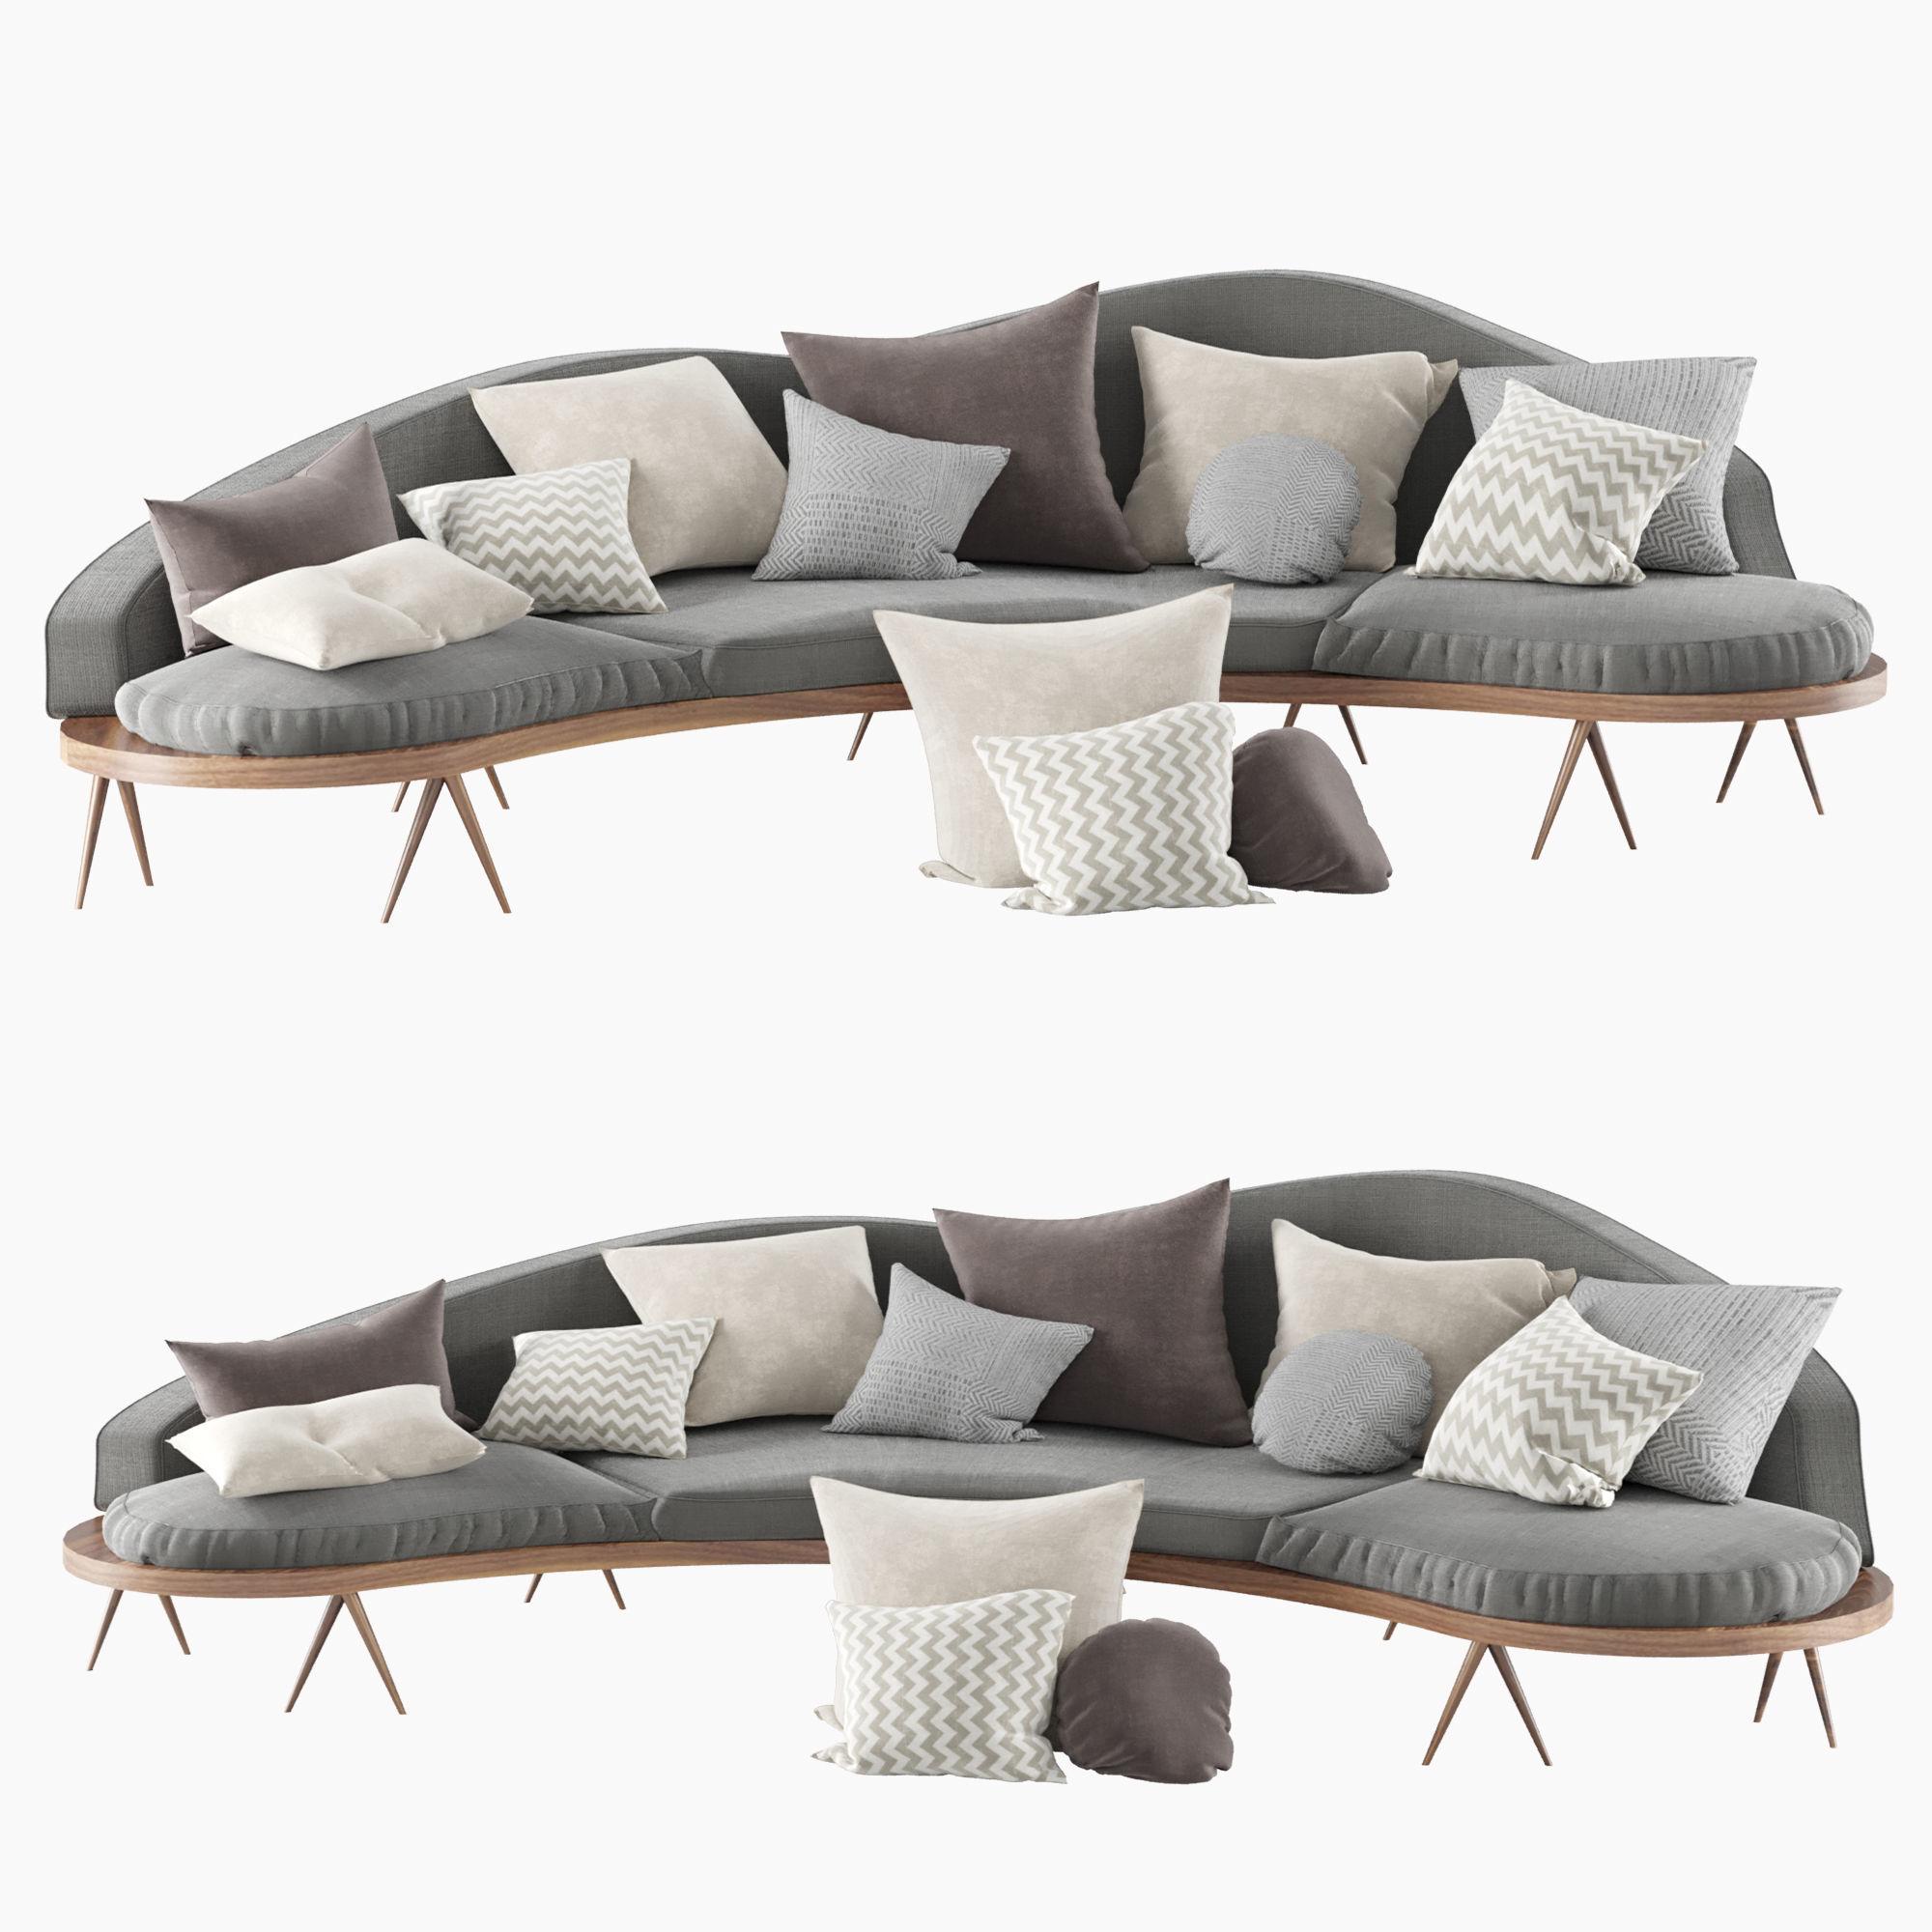 Suit sofa set 3D model | CGTrader